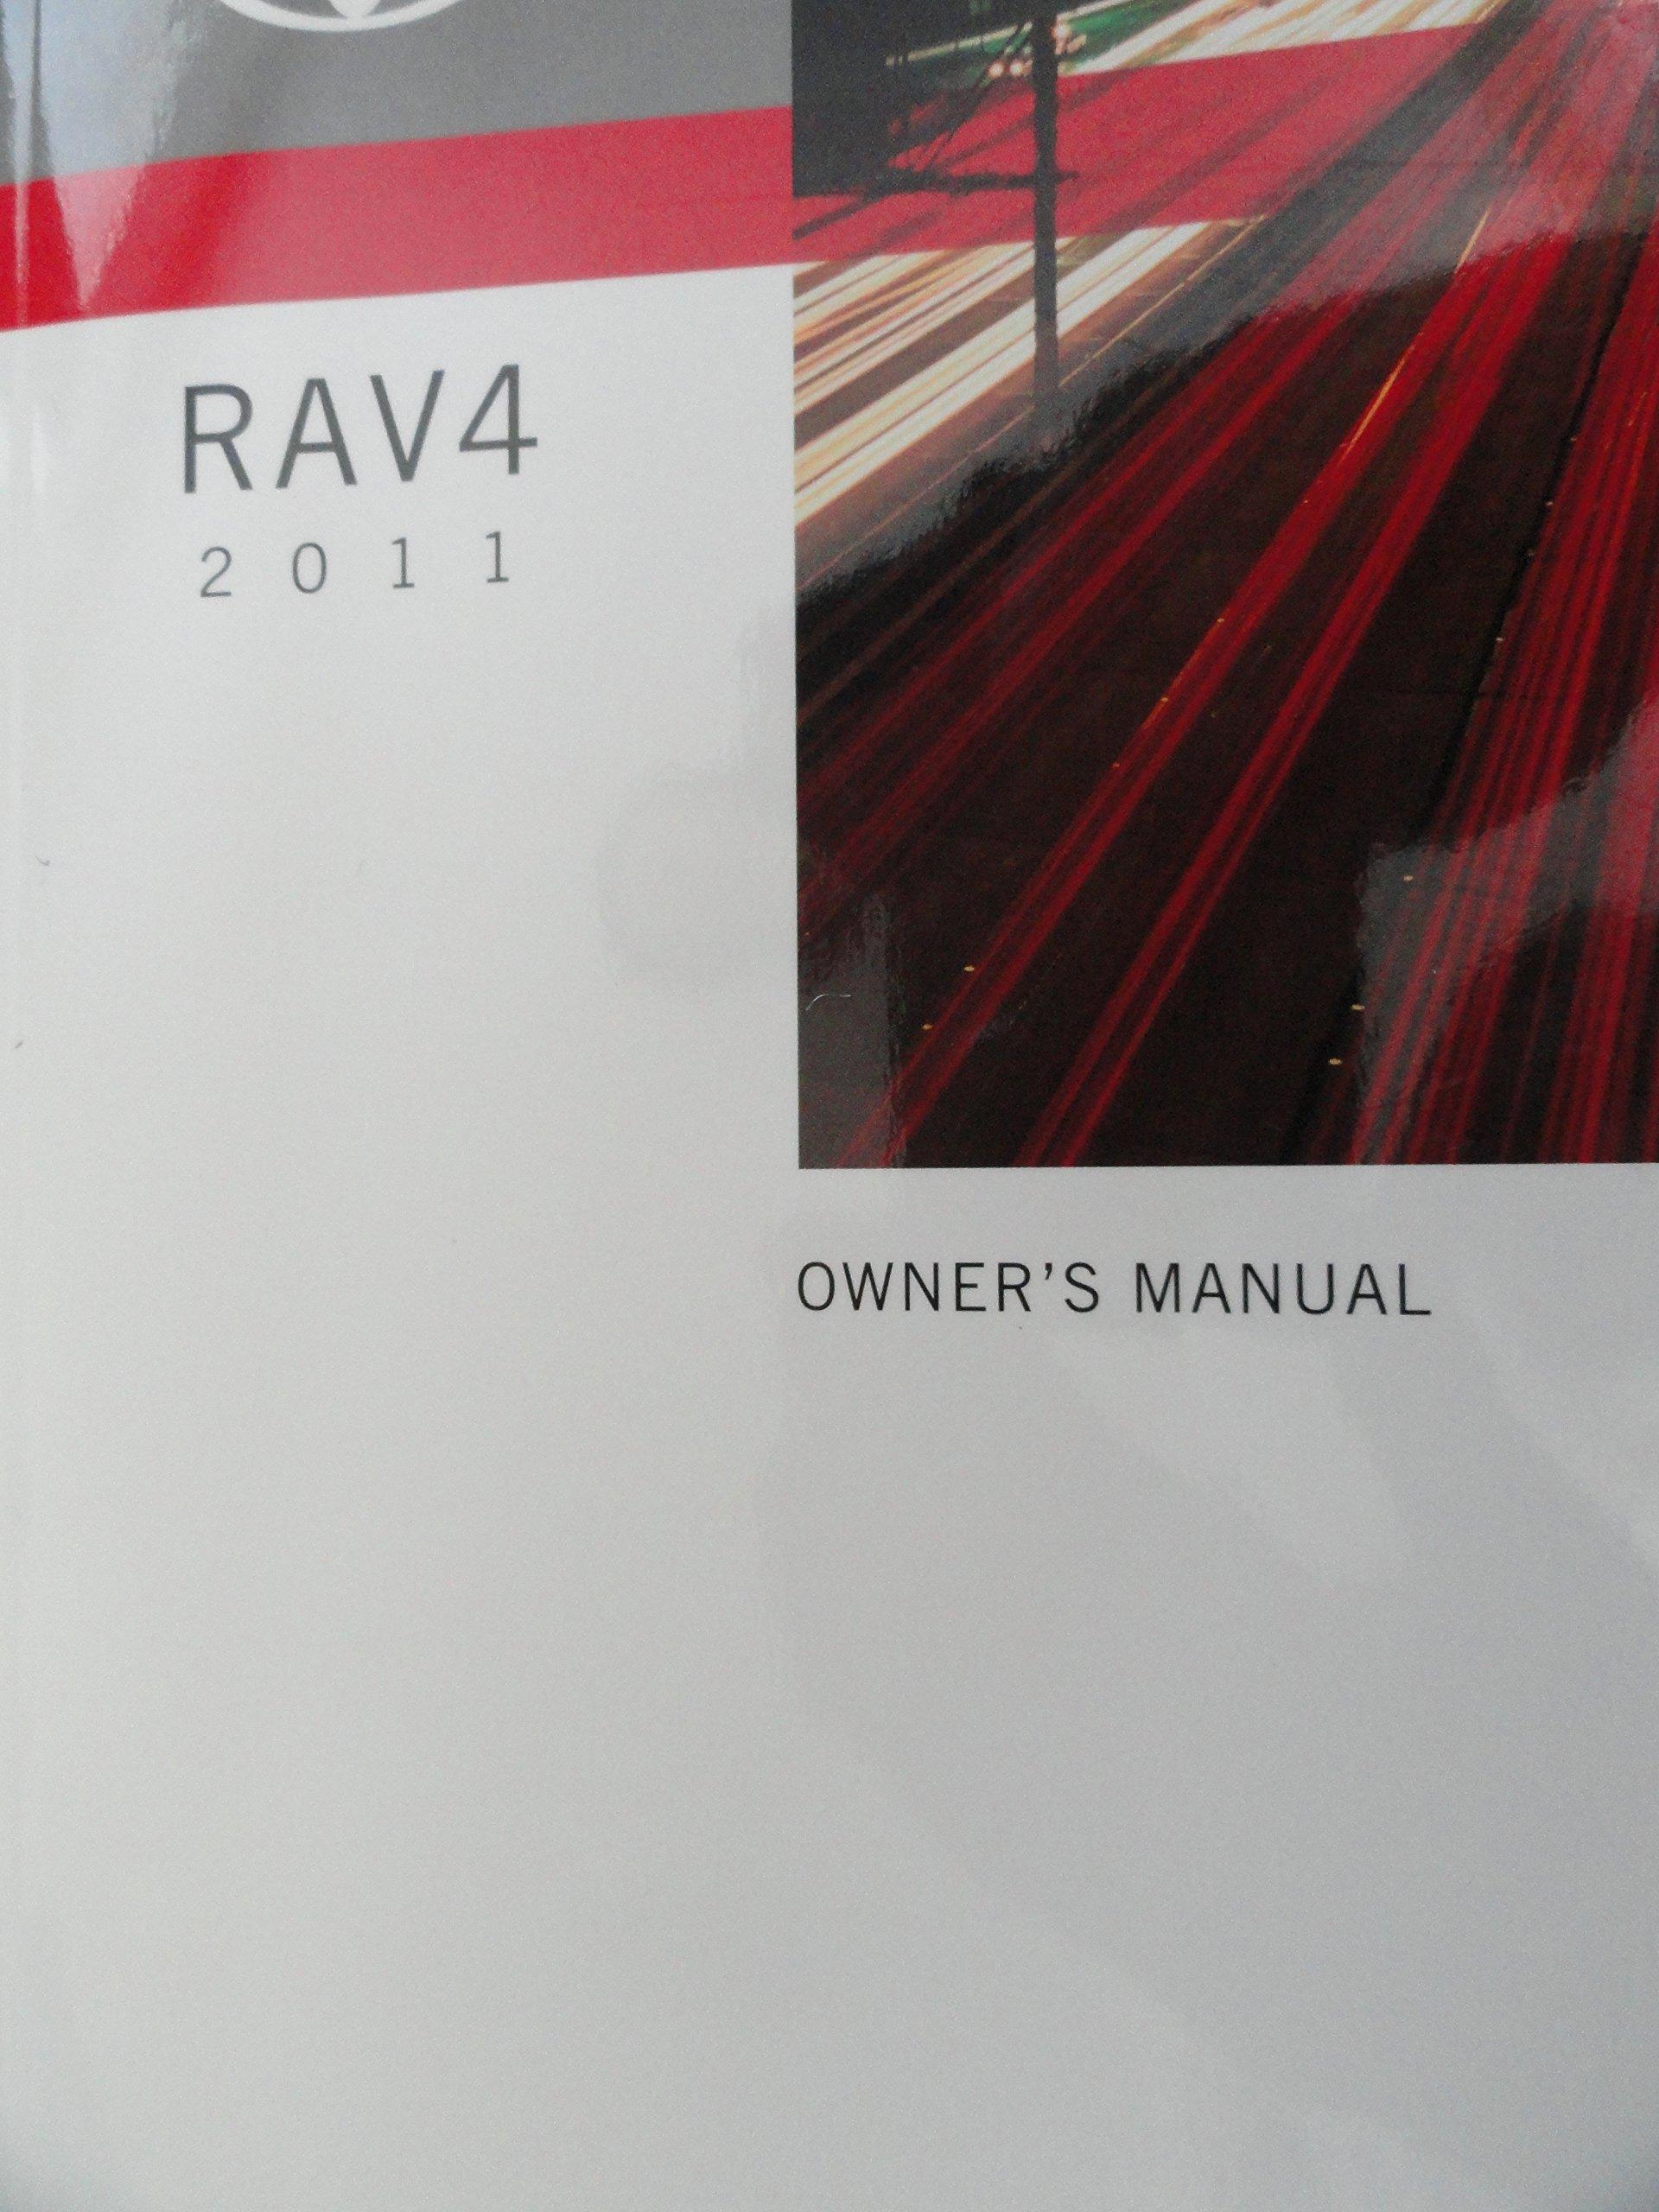 2011 toyota rav4 owners manual toyota amazon com books rh amazon com 2012 toyota rav4 owners manual pdf 2011 toyota rav4 owners manual pdf